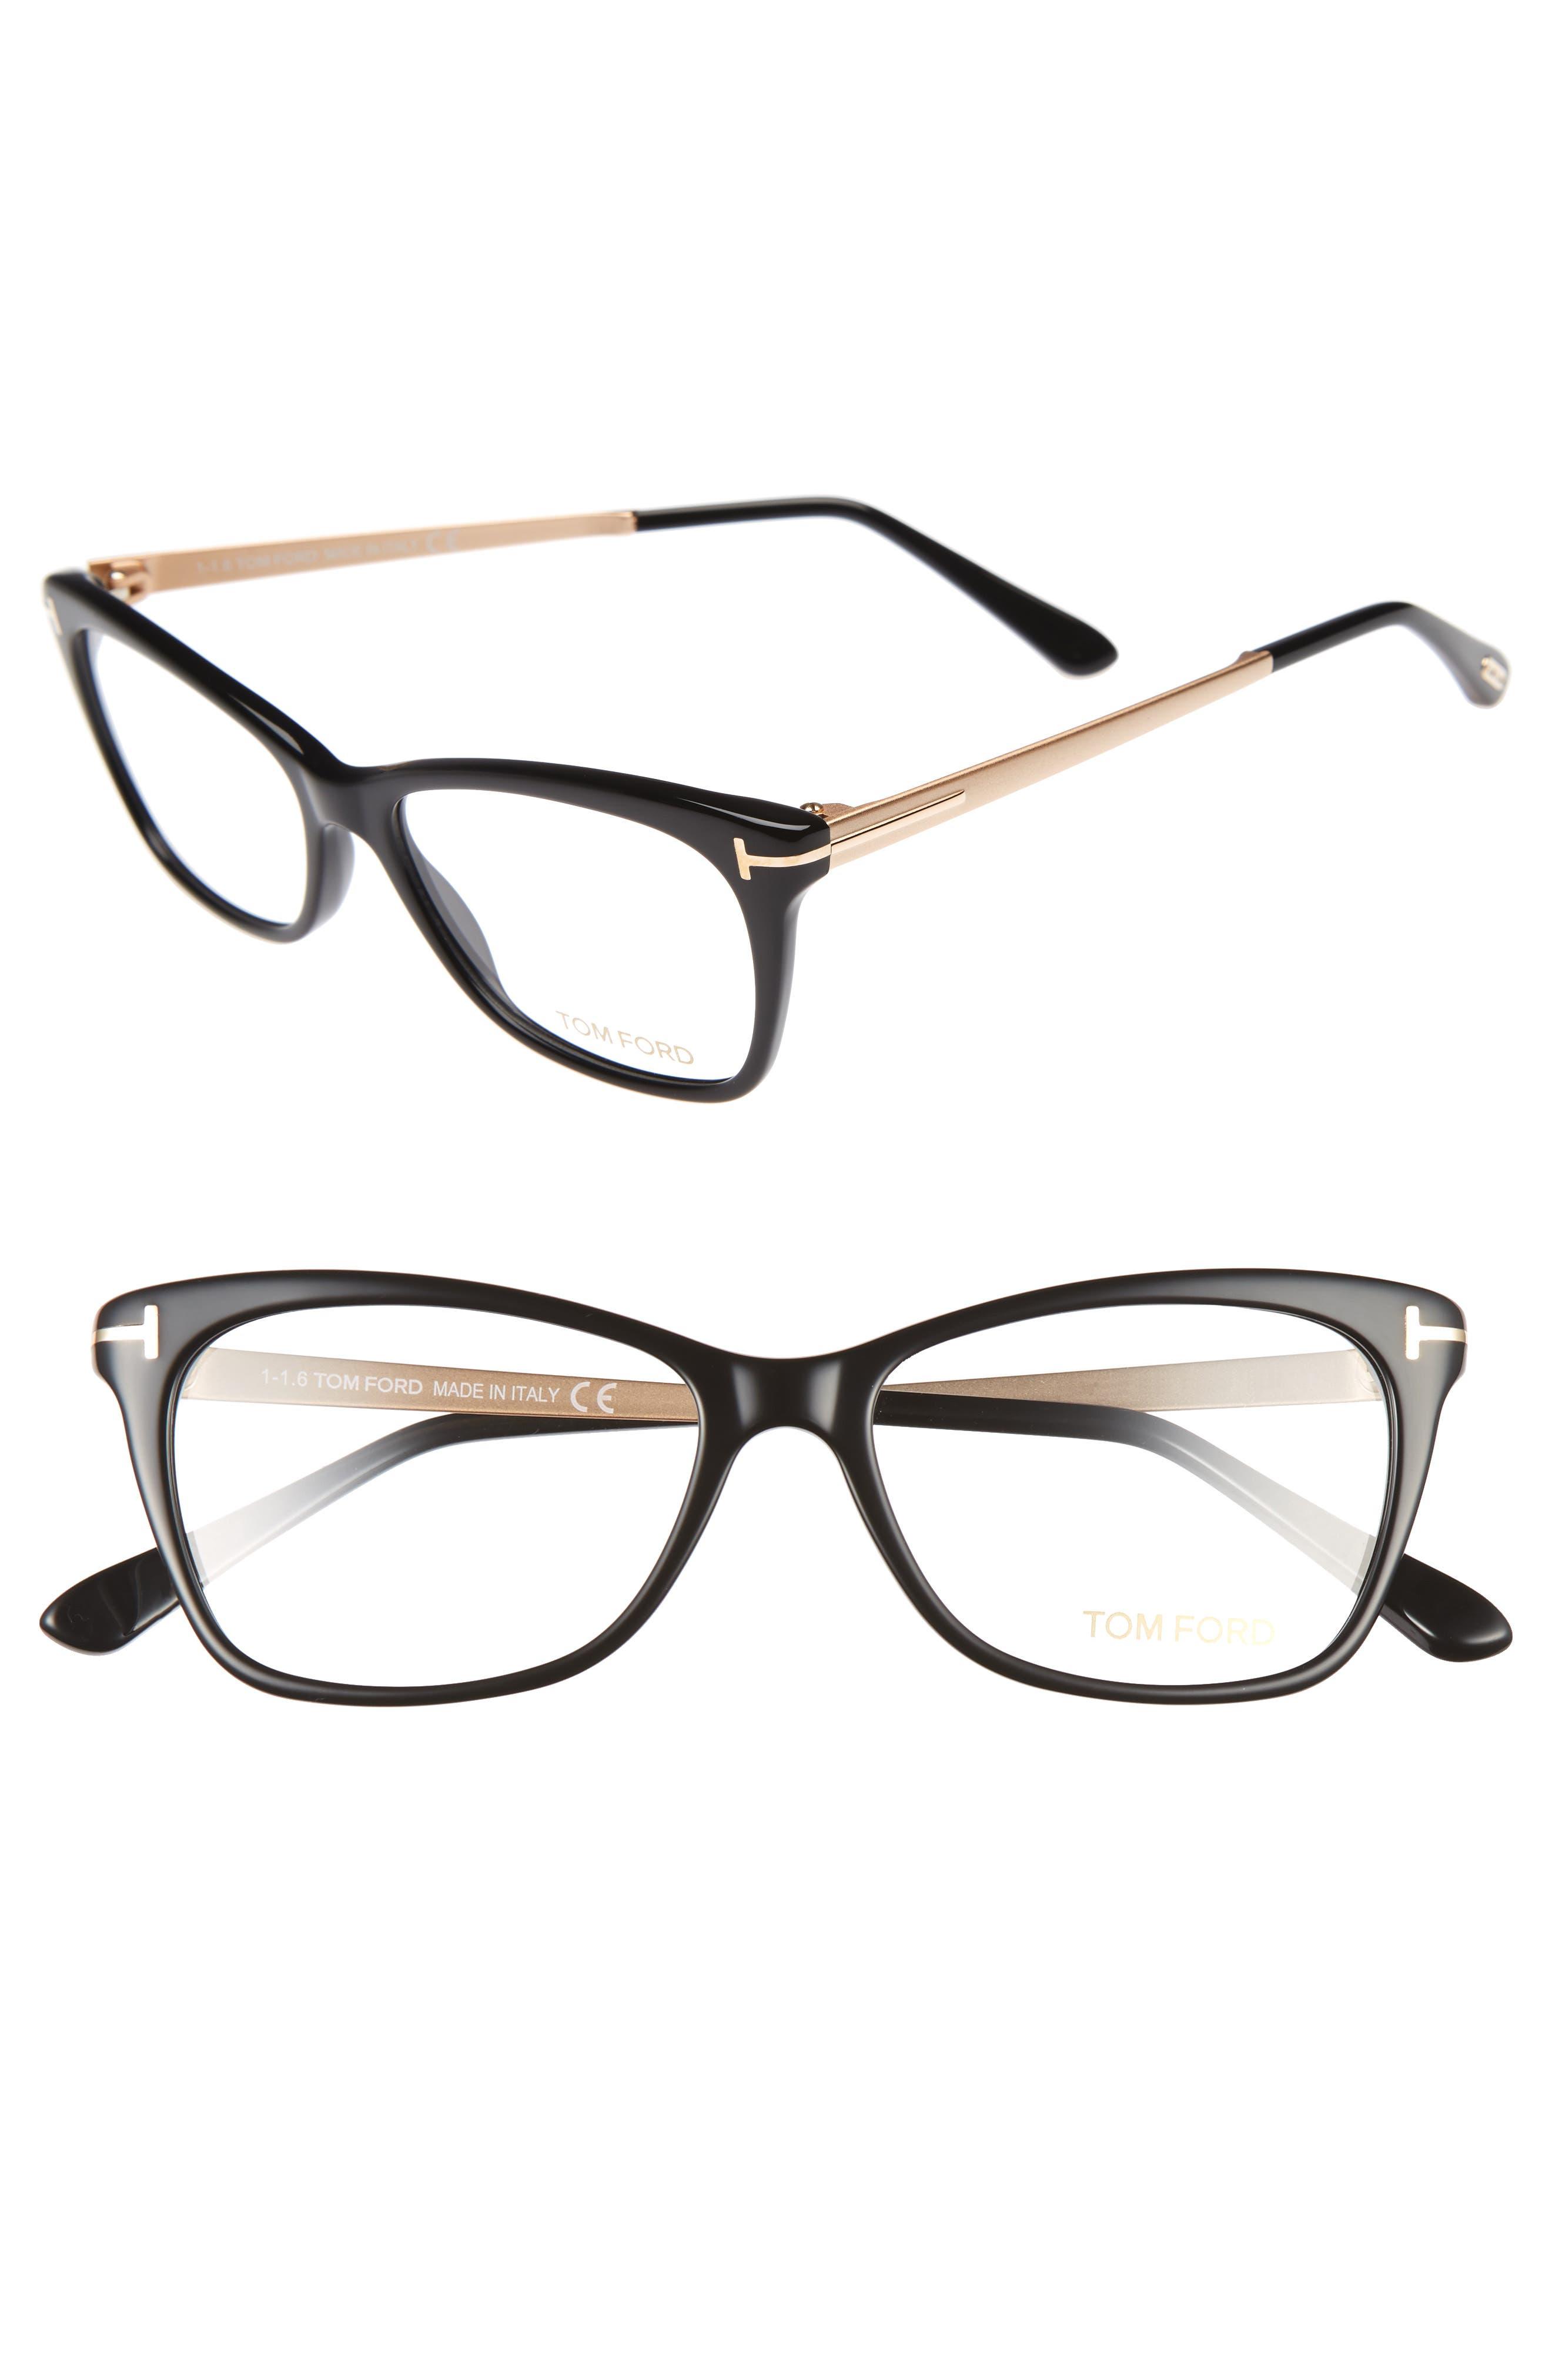 f471b2ca4461 Tom Ford 52Mm Cat Eye Optical Glasses - Shiny Black